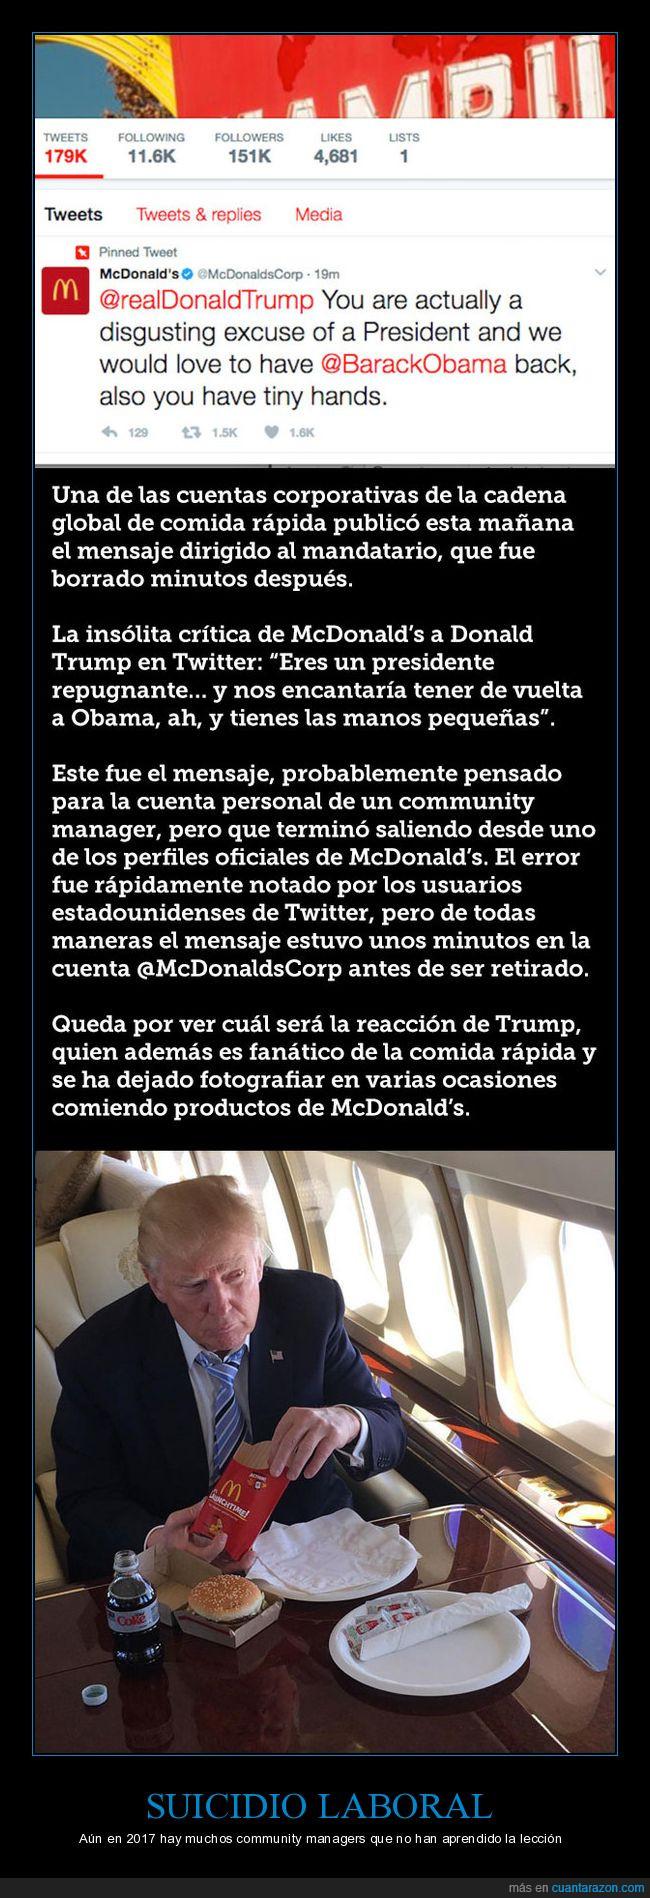 donald trump,liada,mcdonalds,odio,tweet